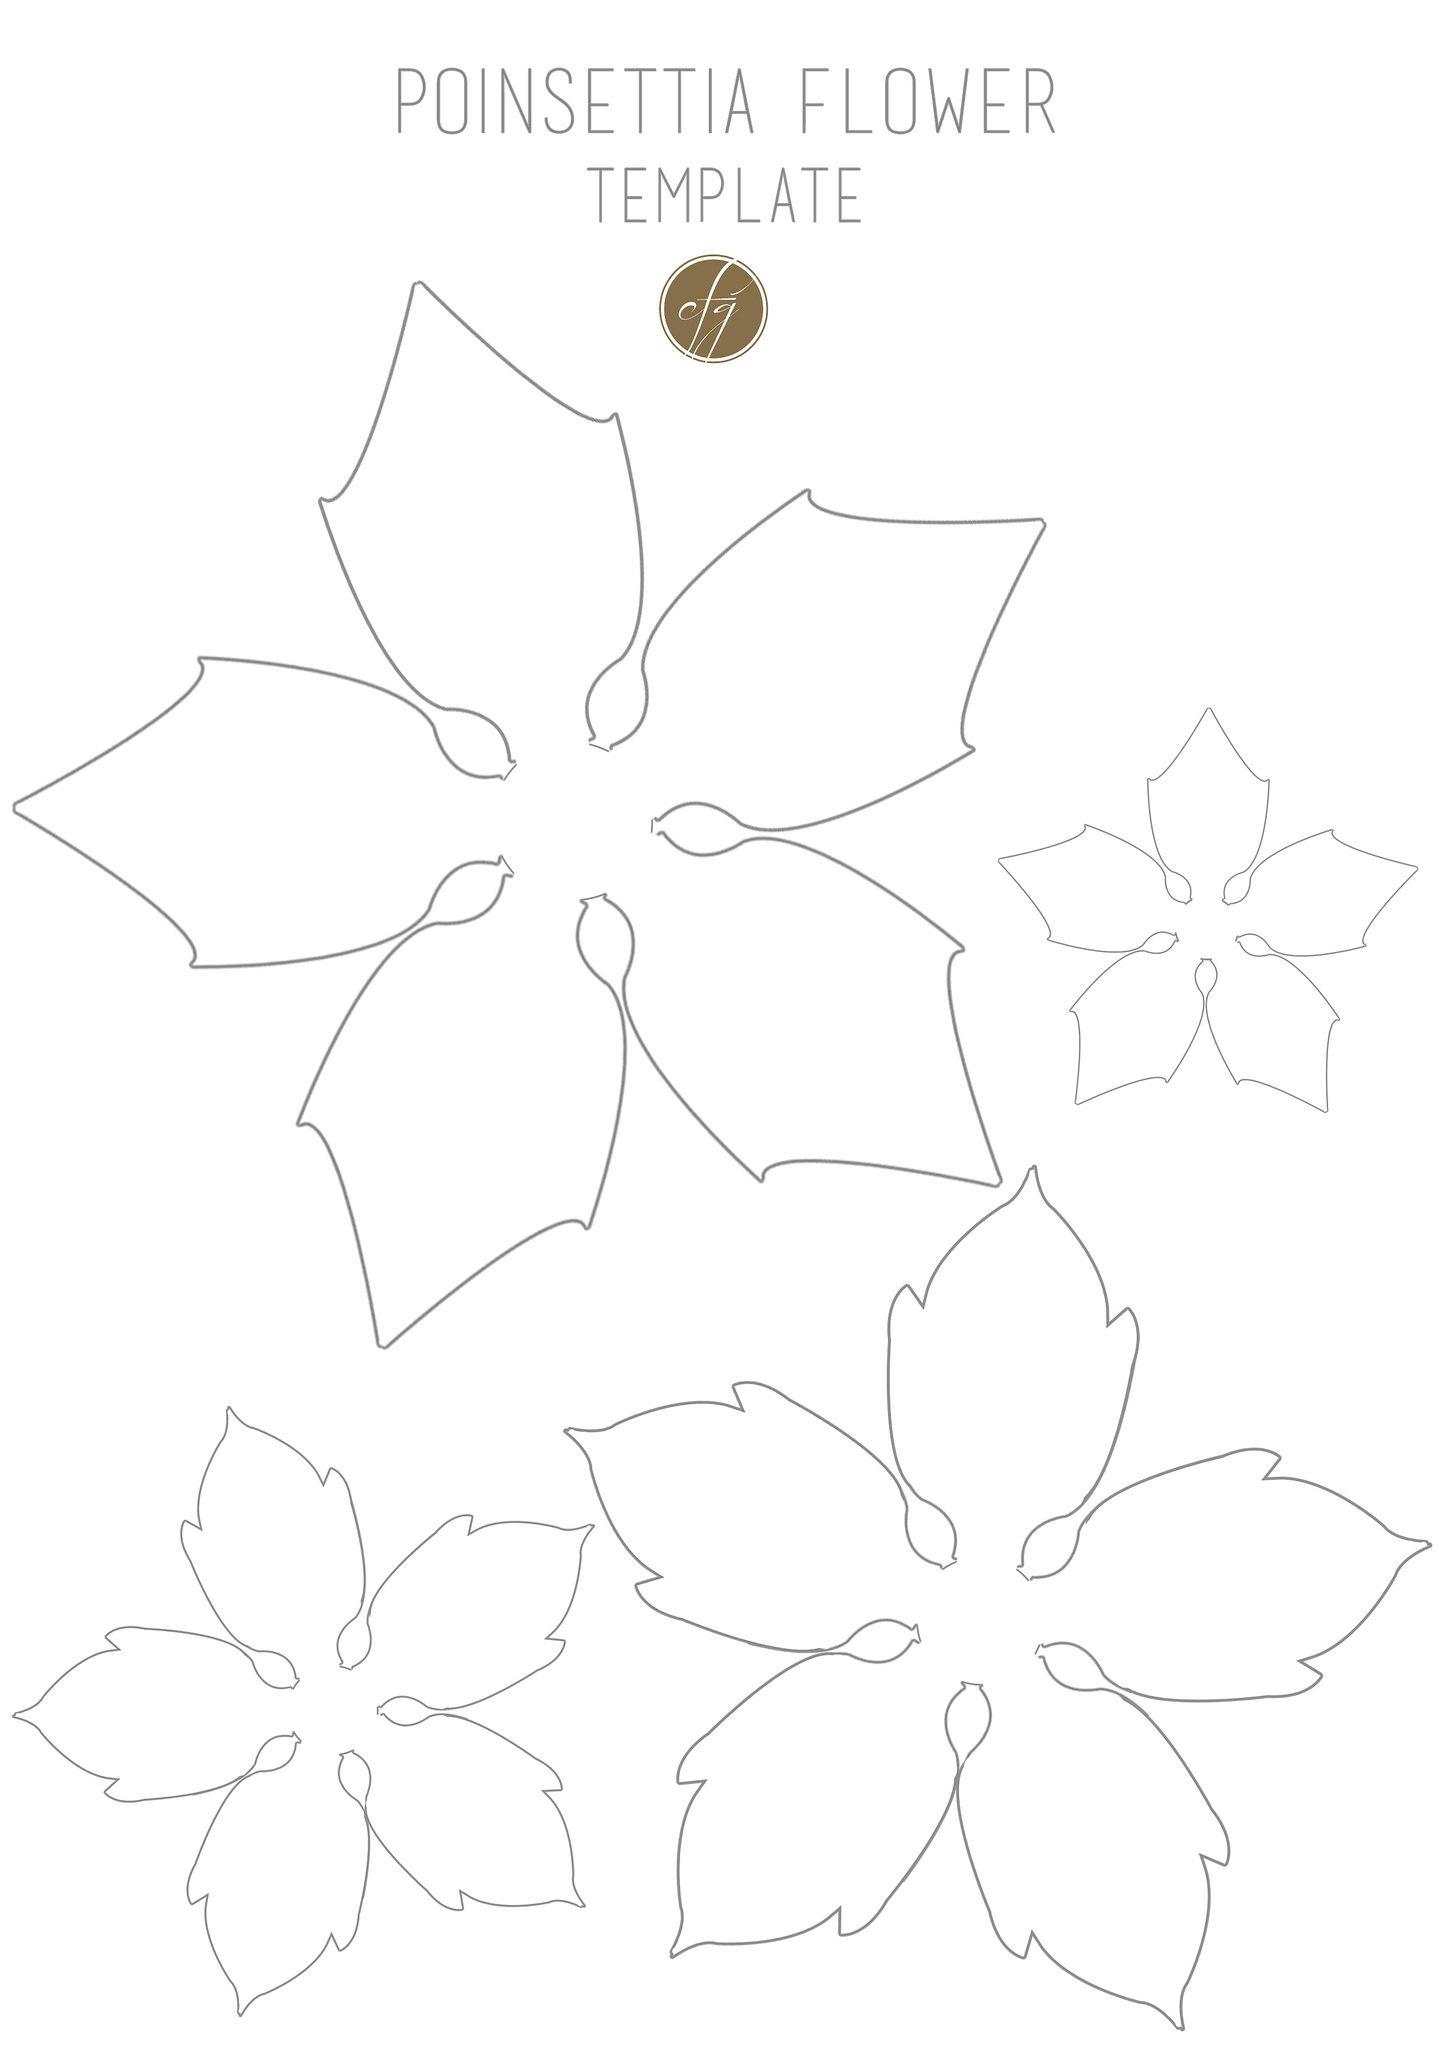 Poinsettia Flower Template Iii Copy Paper Flowers Flower Template Poinsettia Flower